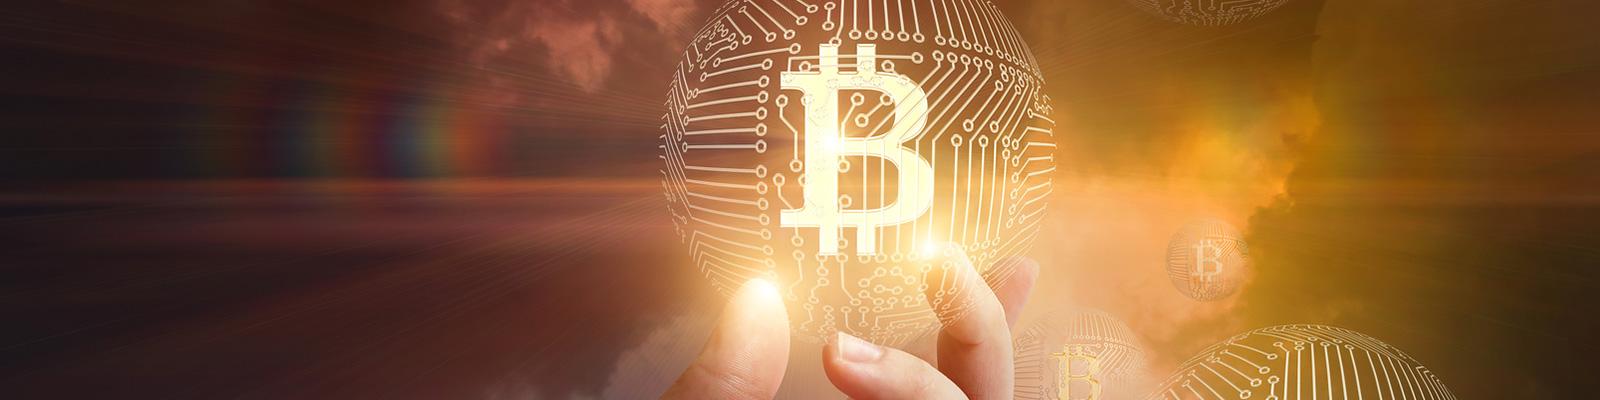 bitcoin イメージ